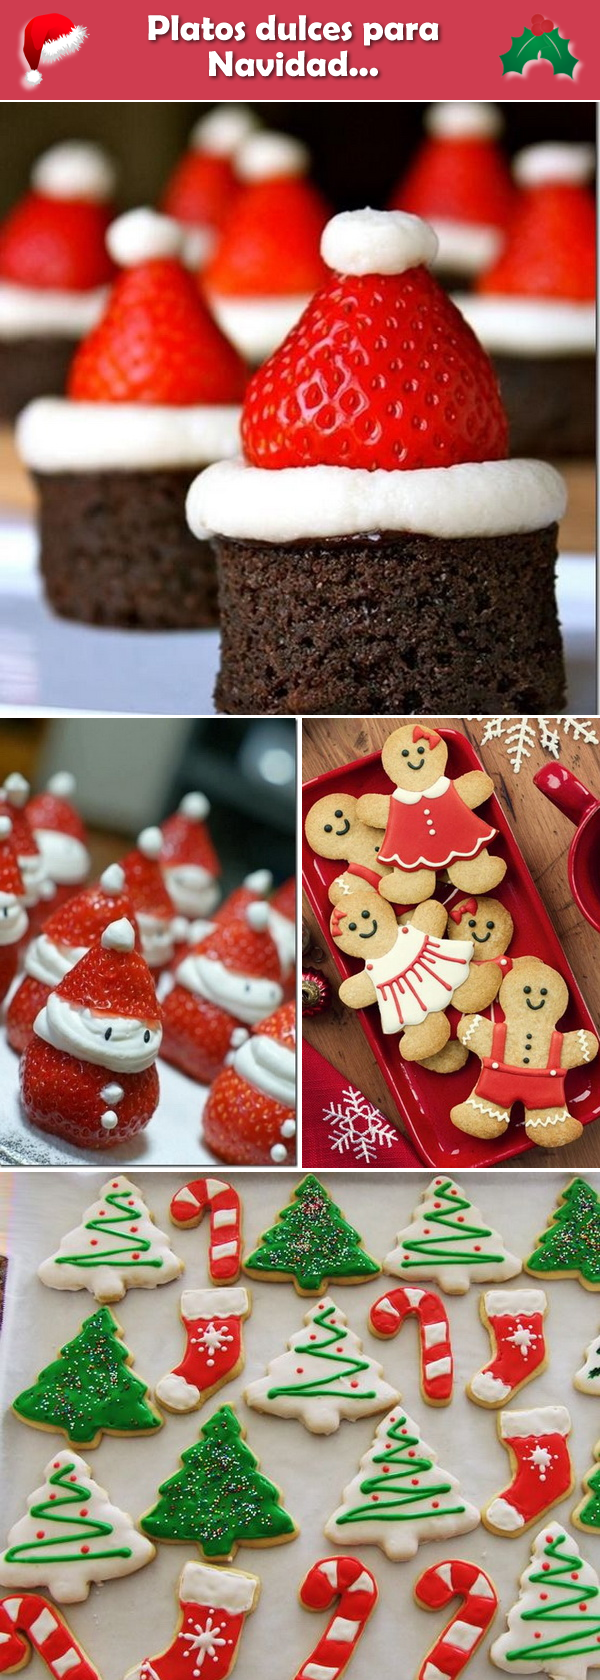 Platos dulces para navidad platos navide os postres for Platos dulces